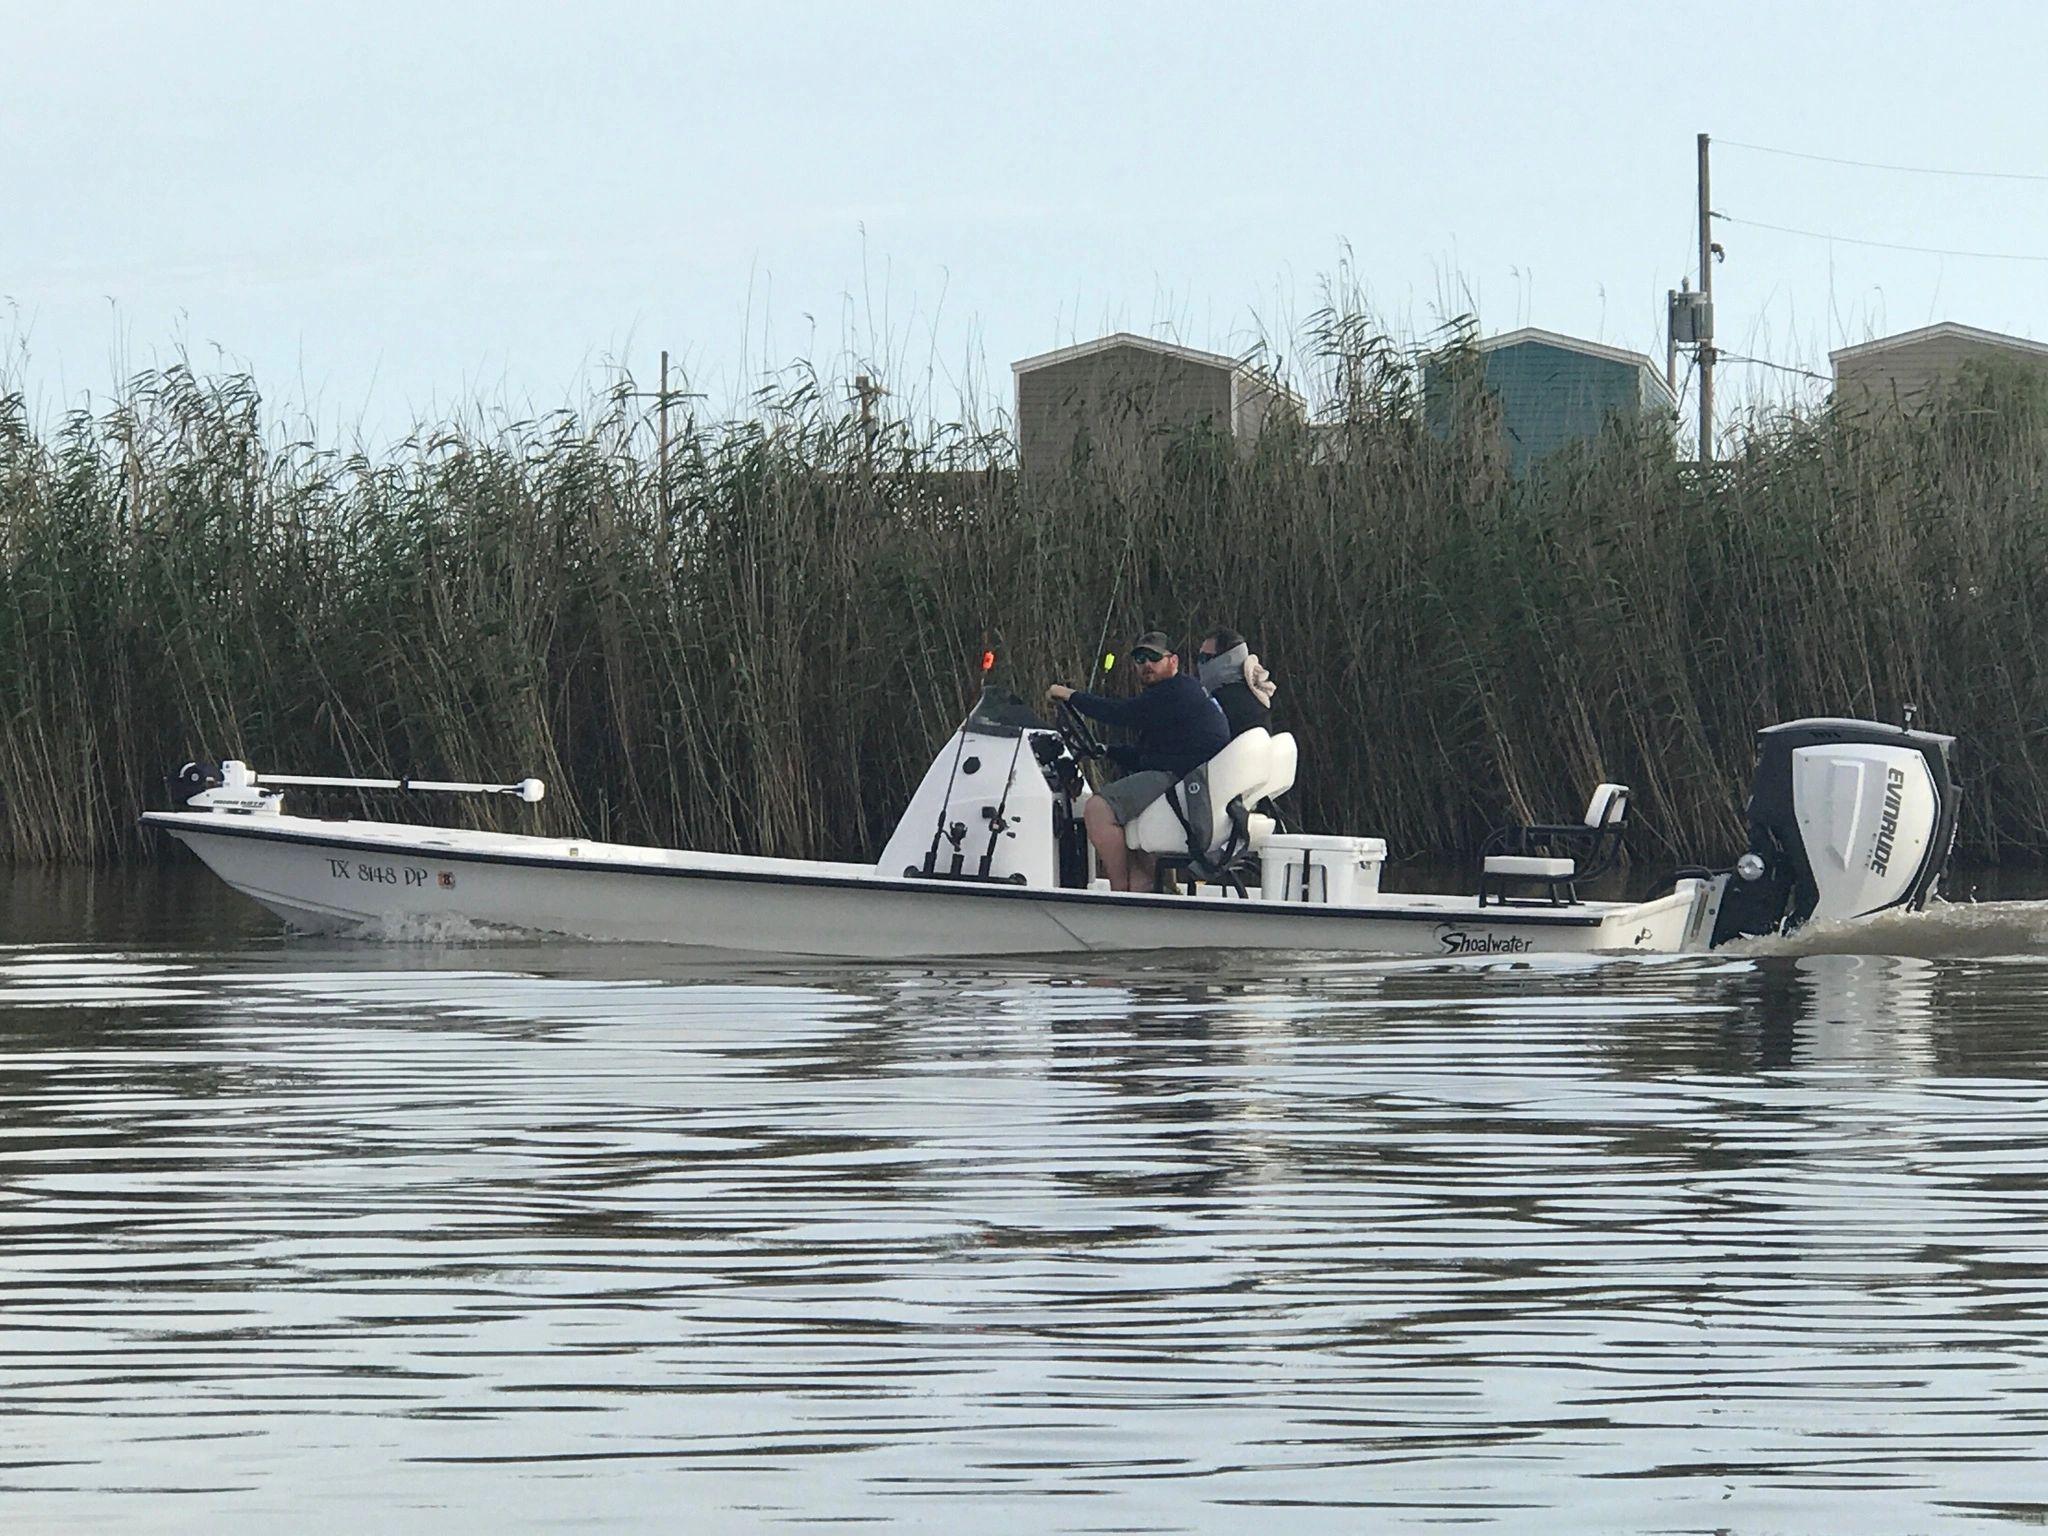 Yellowskeeter Marine - Boat Electronics, Boat Repairs, Boat